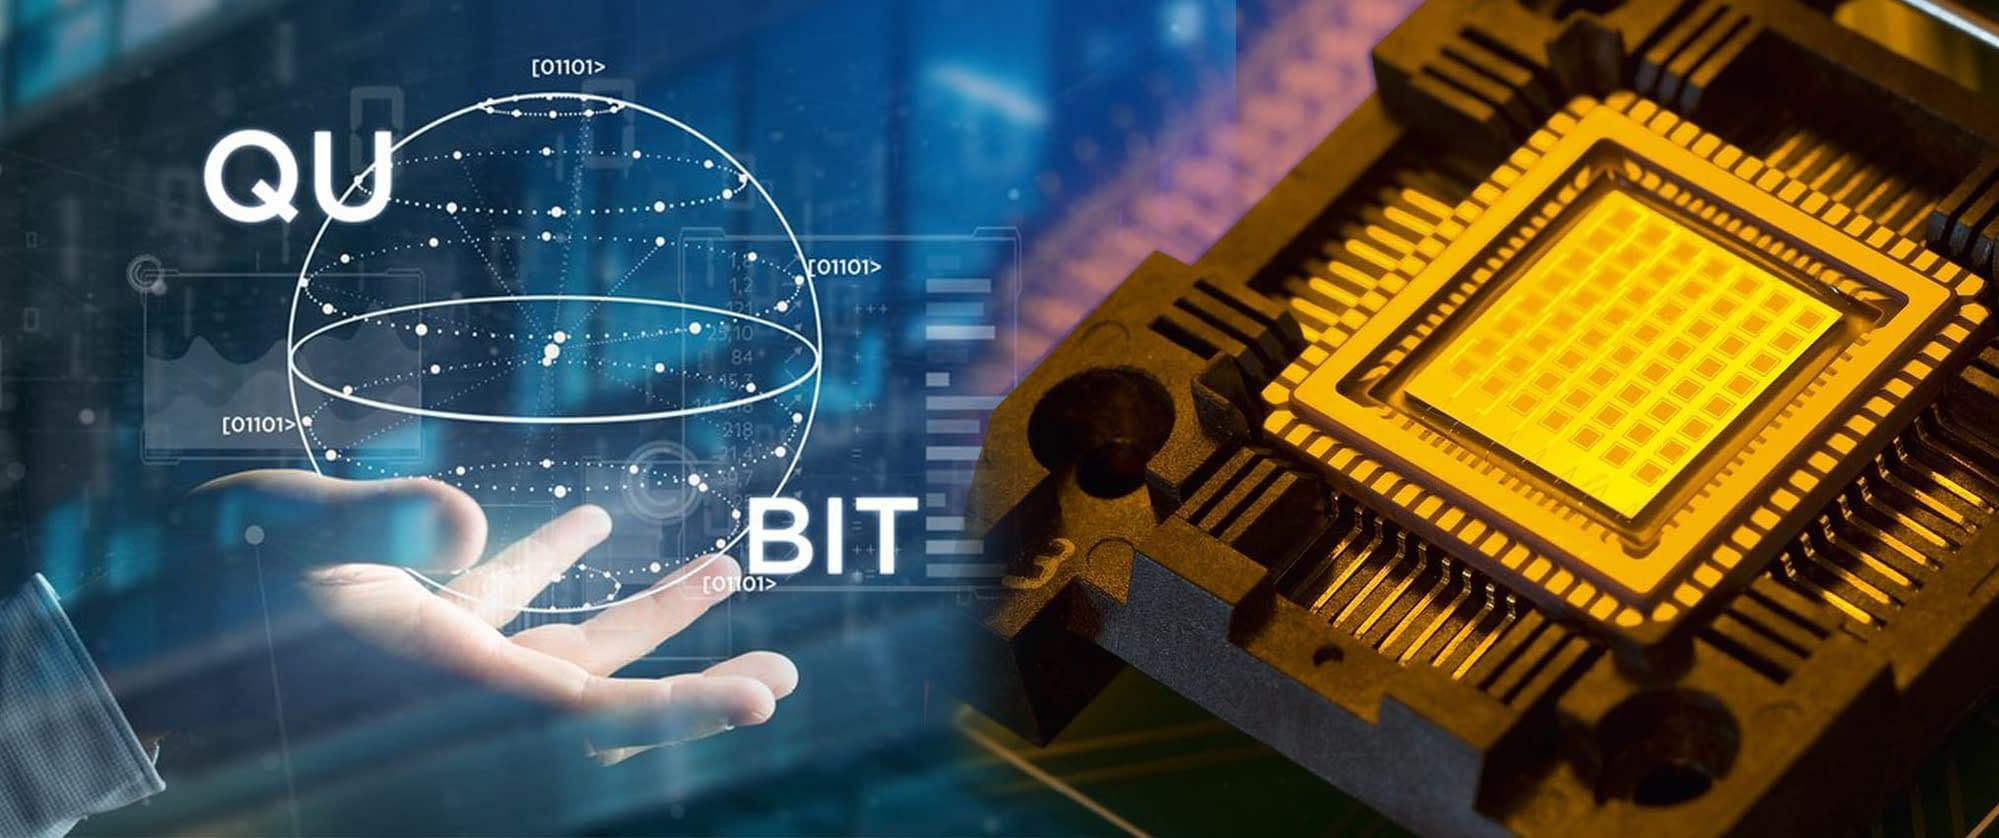 Beyond qubits to scale up quantum computing